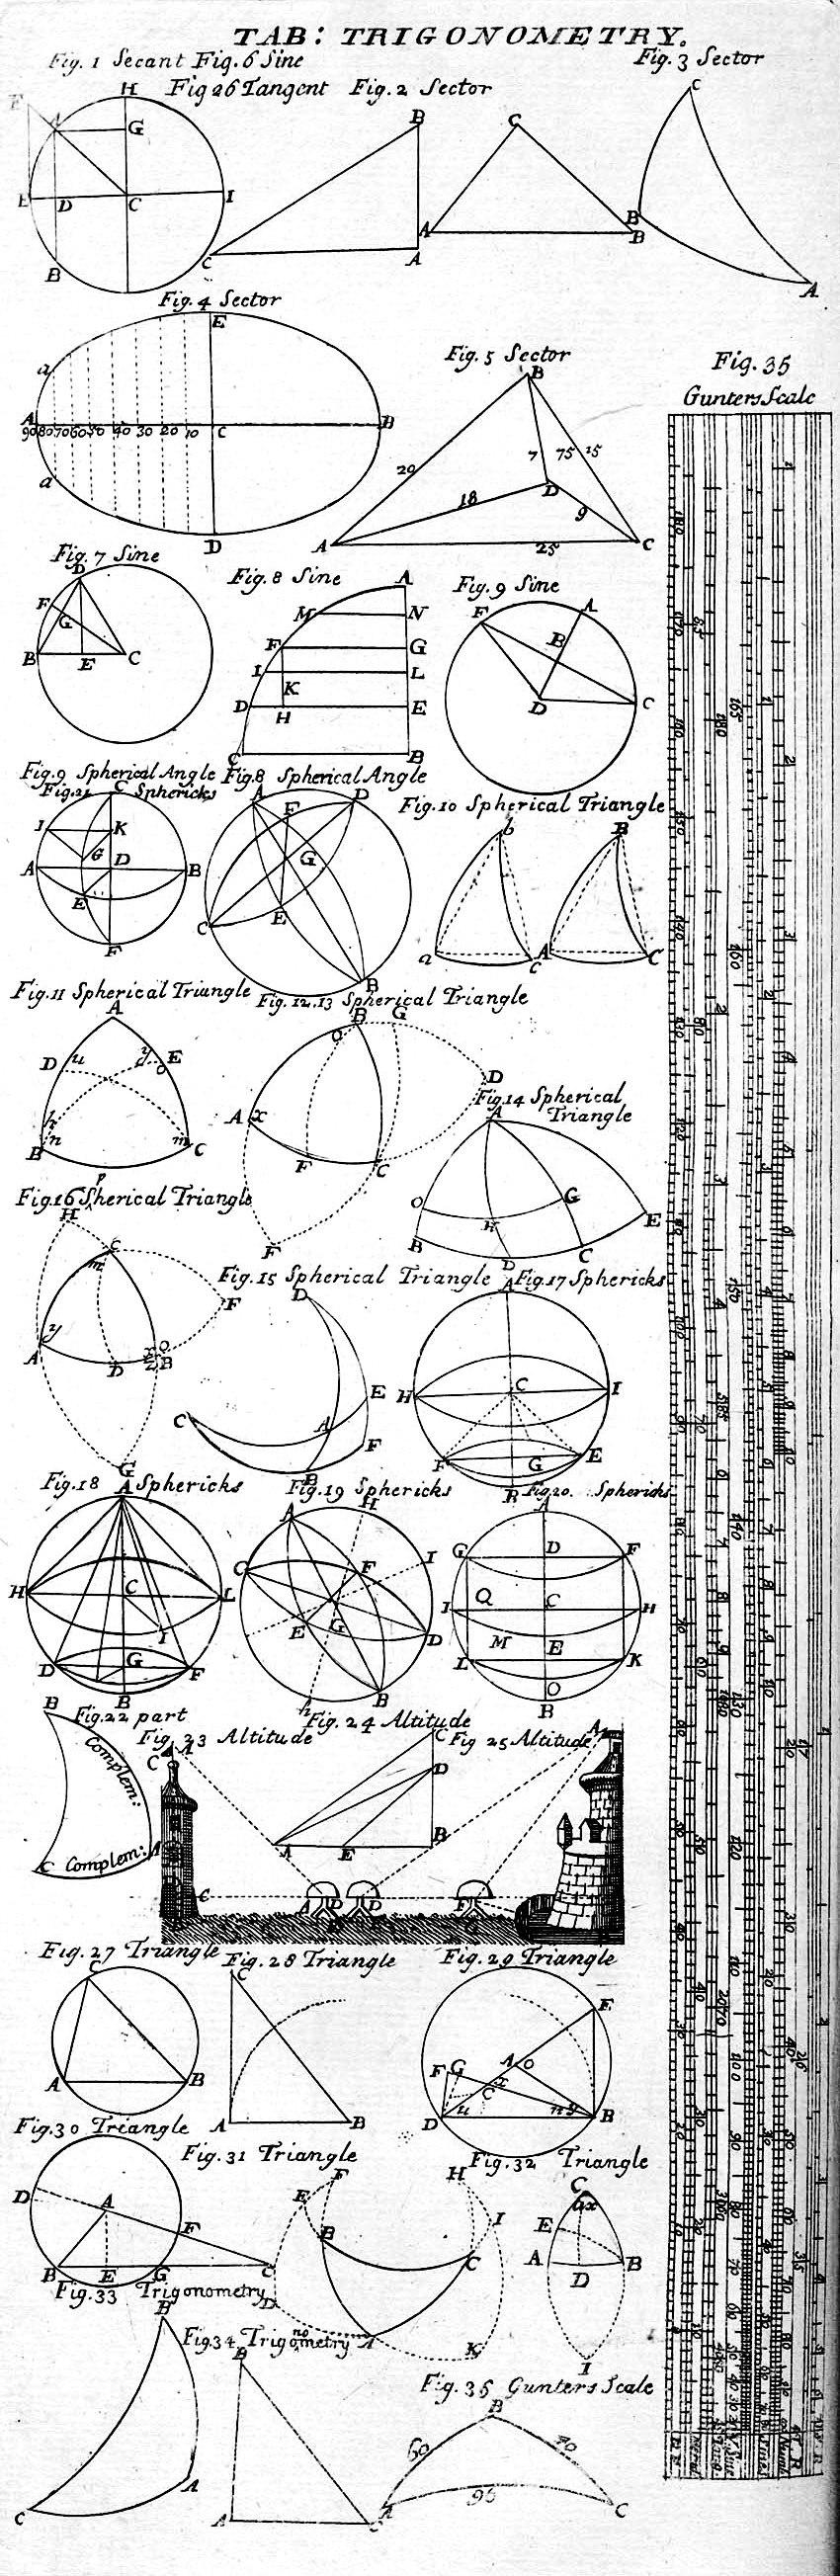 Table of Trigonometry, Cyclopaedia, Volume 2